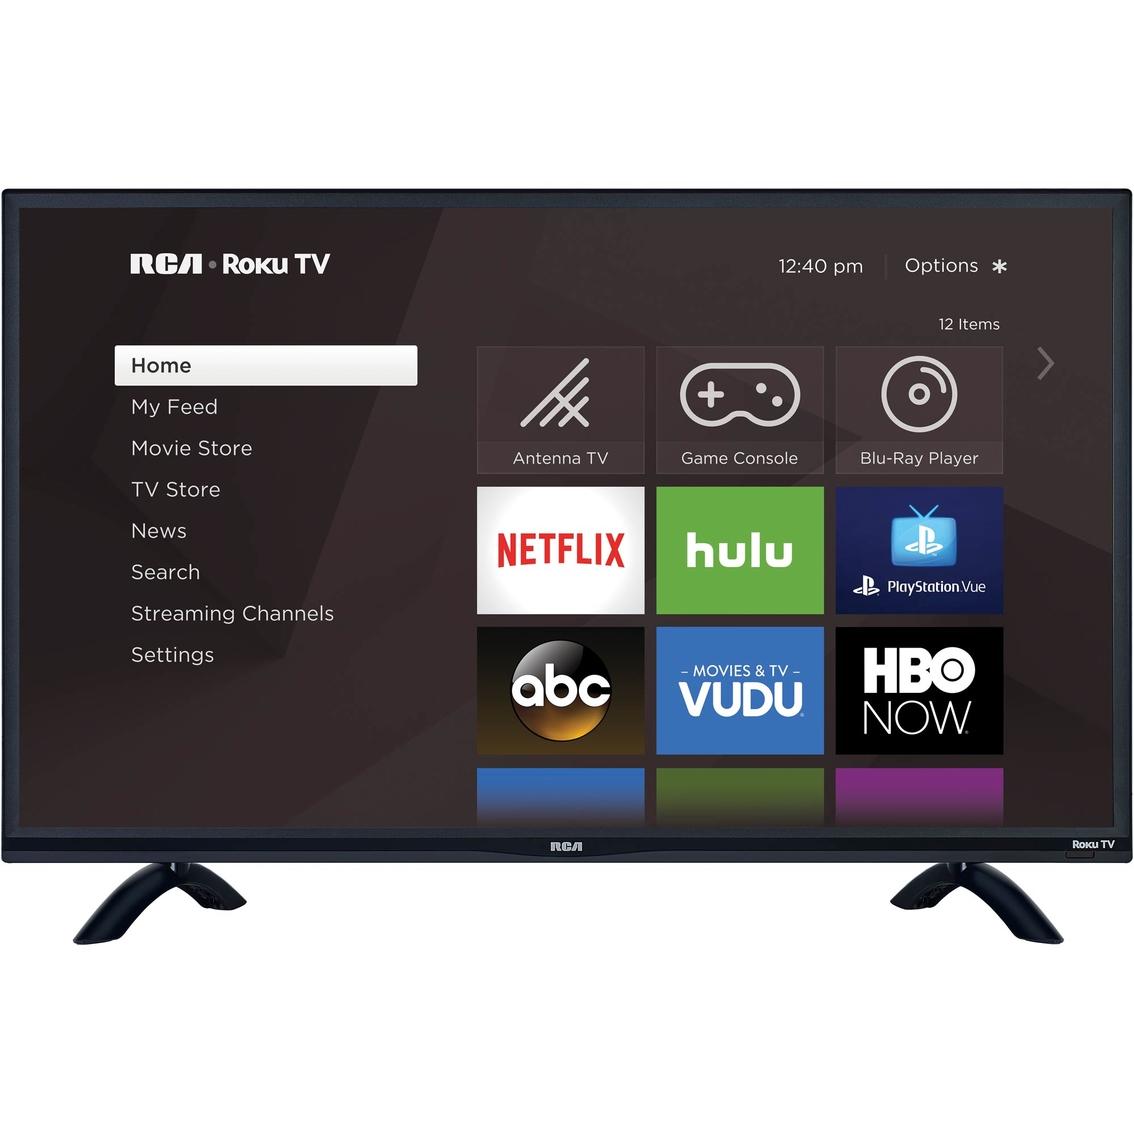 Rca 32 In  720p Led Roku Smart Tv | Tvs | Electronics | Shop The